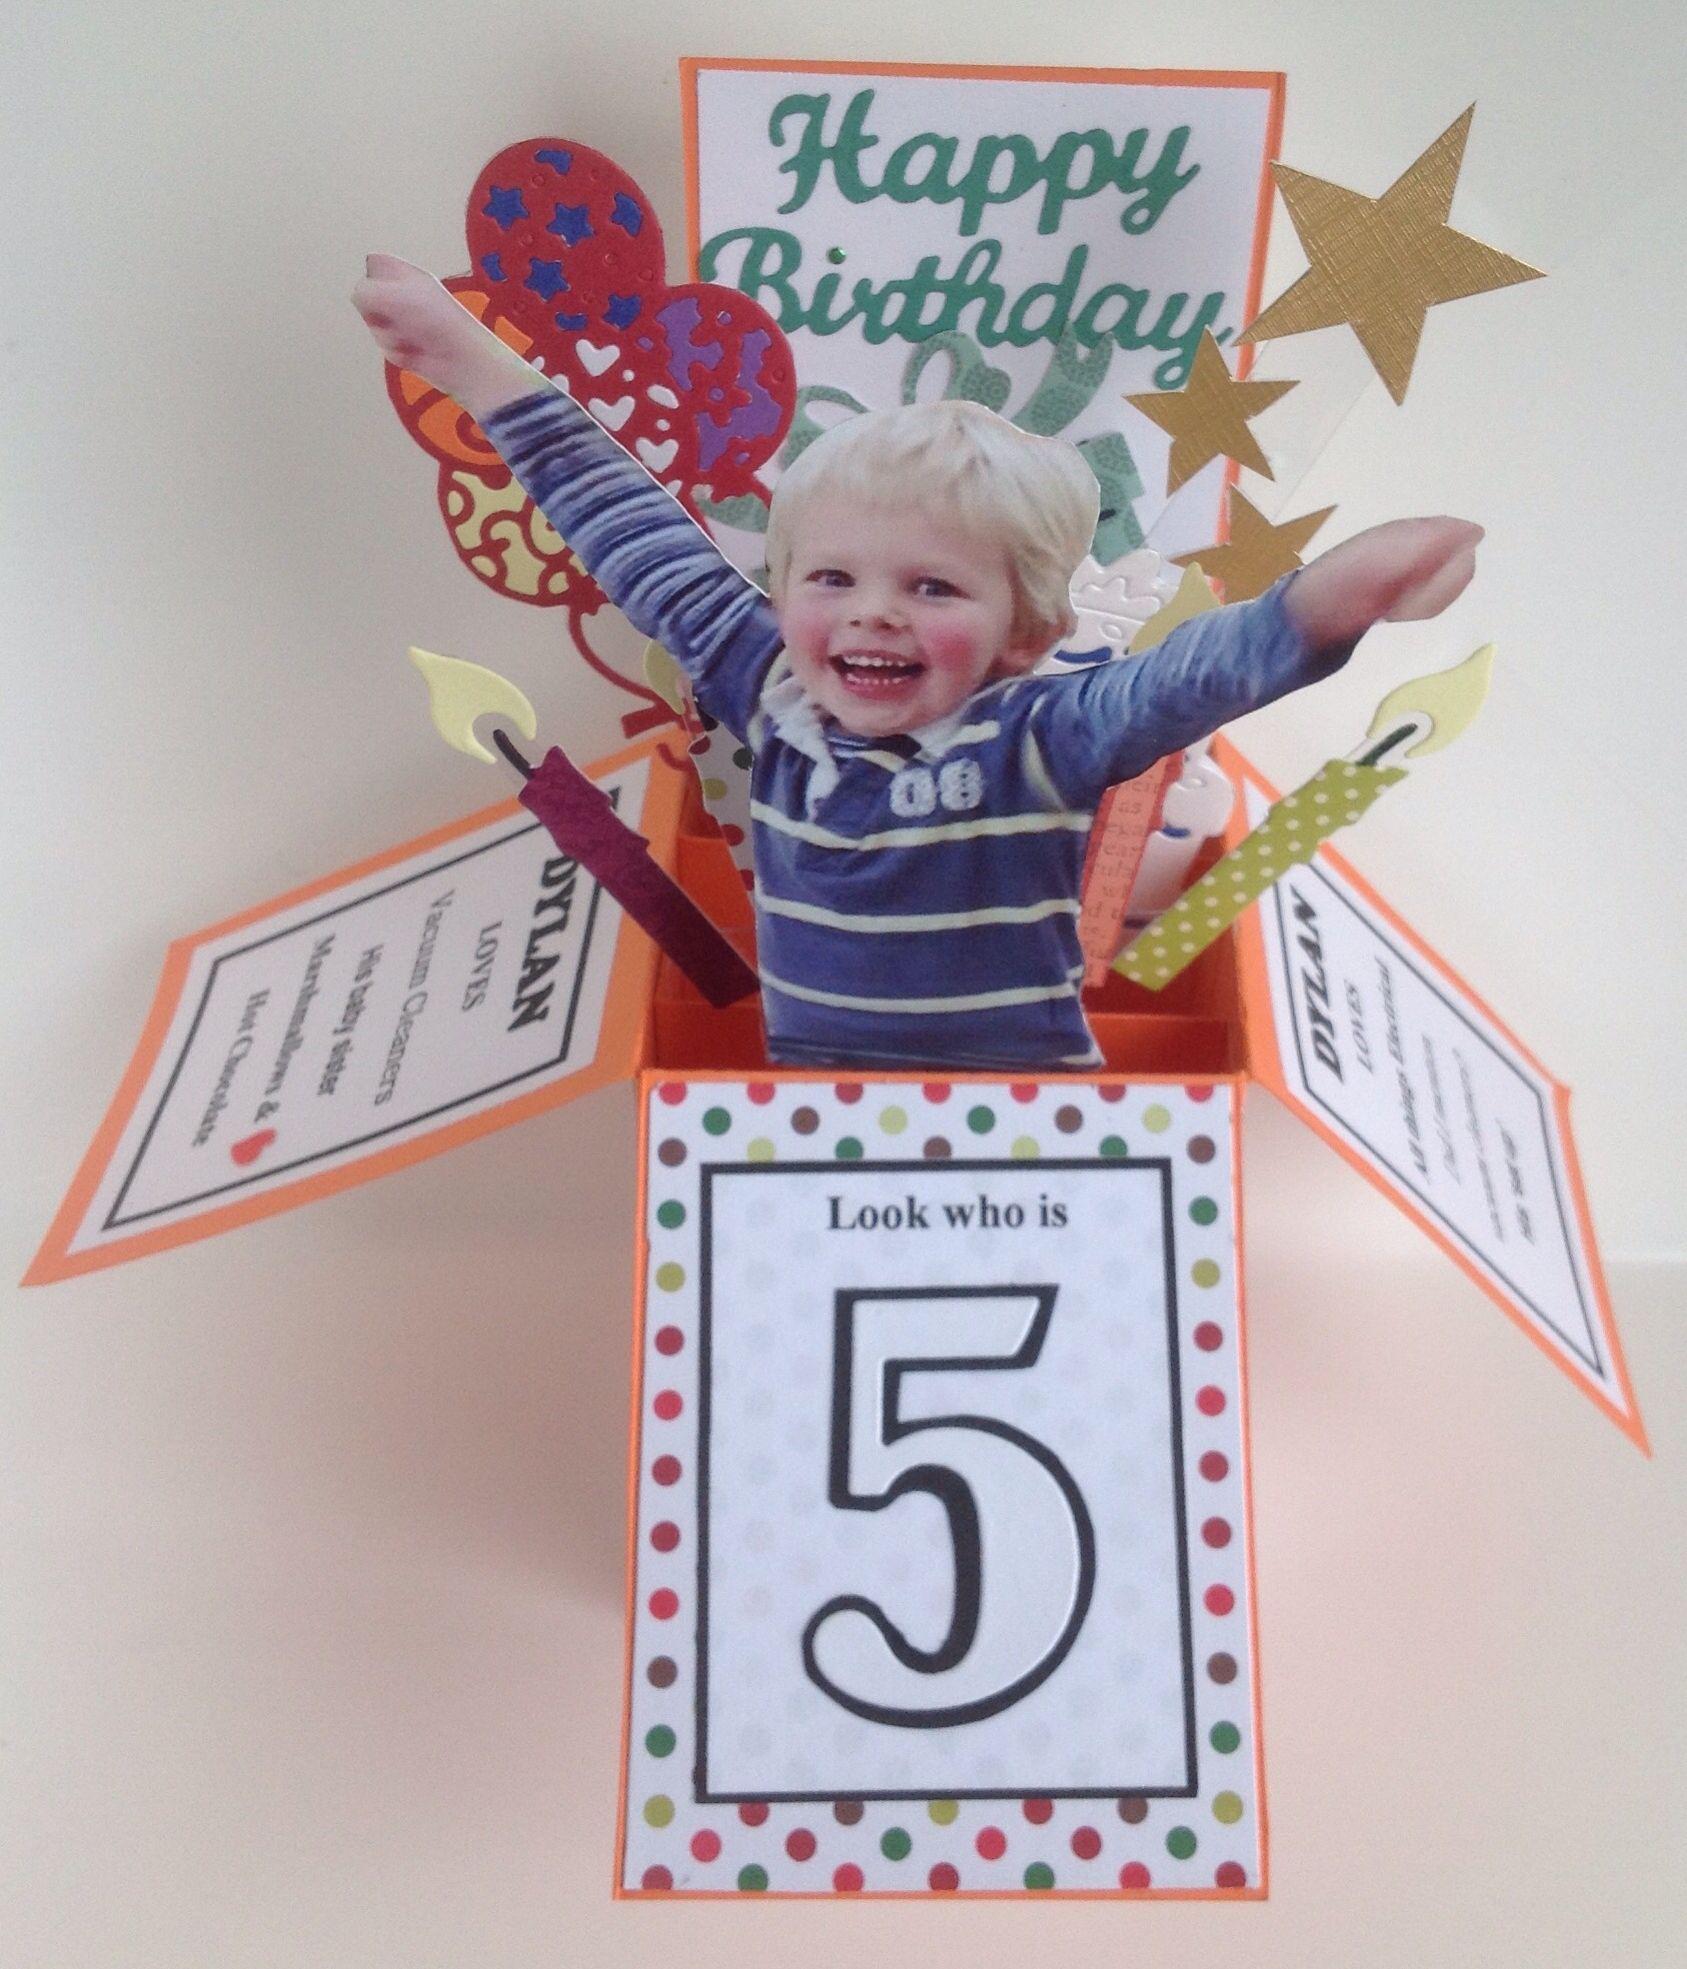 5th Birthday Card In A Box Boxed Birthday Cards Birthday Card Pop Up Box Cards Tutorial